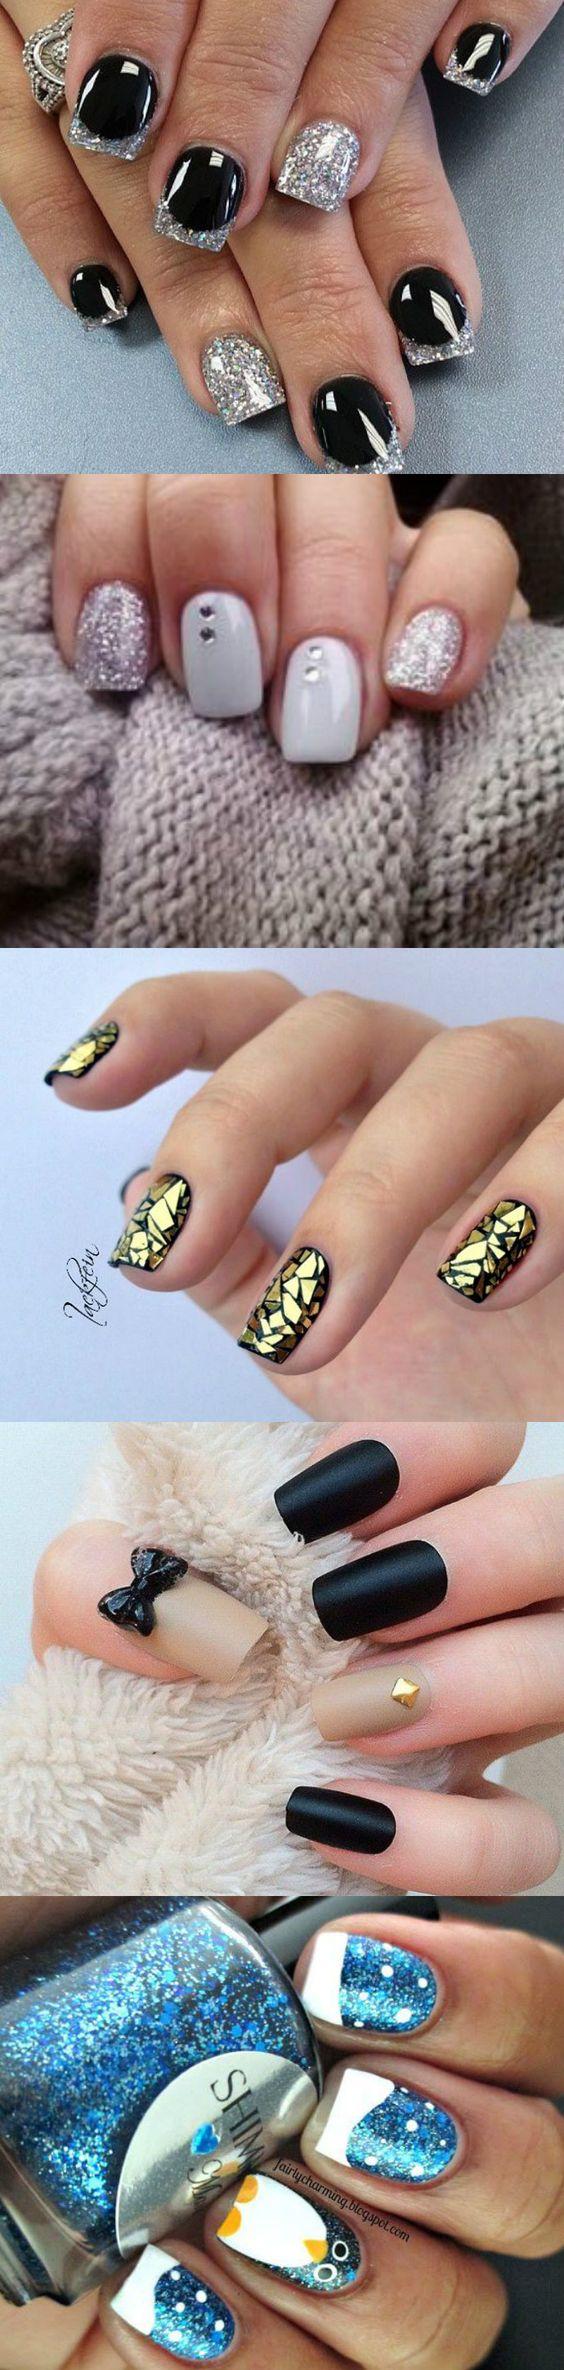 55 Stunning Nail Art & Designs 2016 | Nail art designs 2016, Designs ...